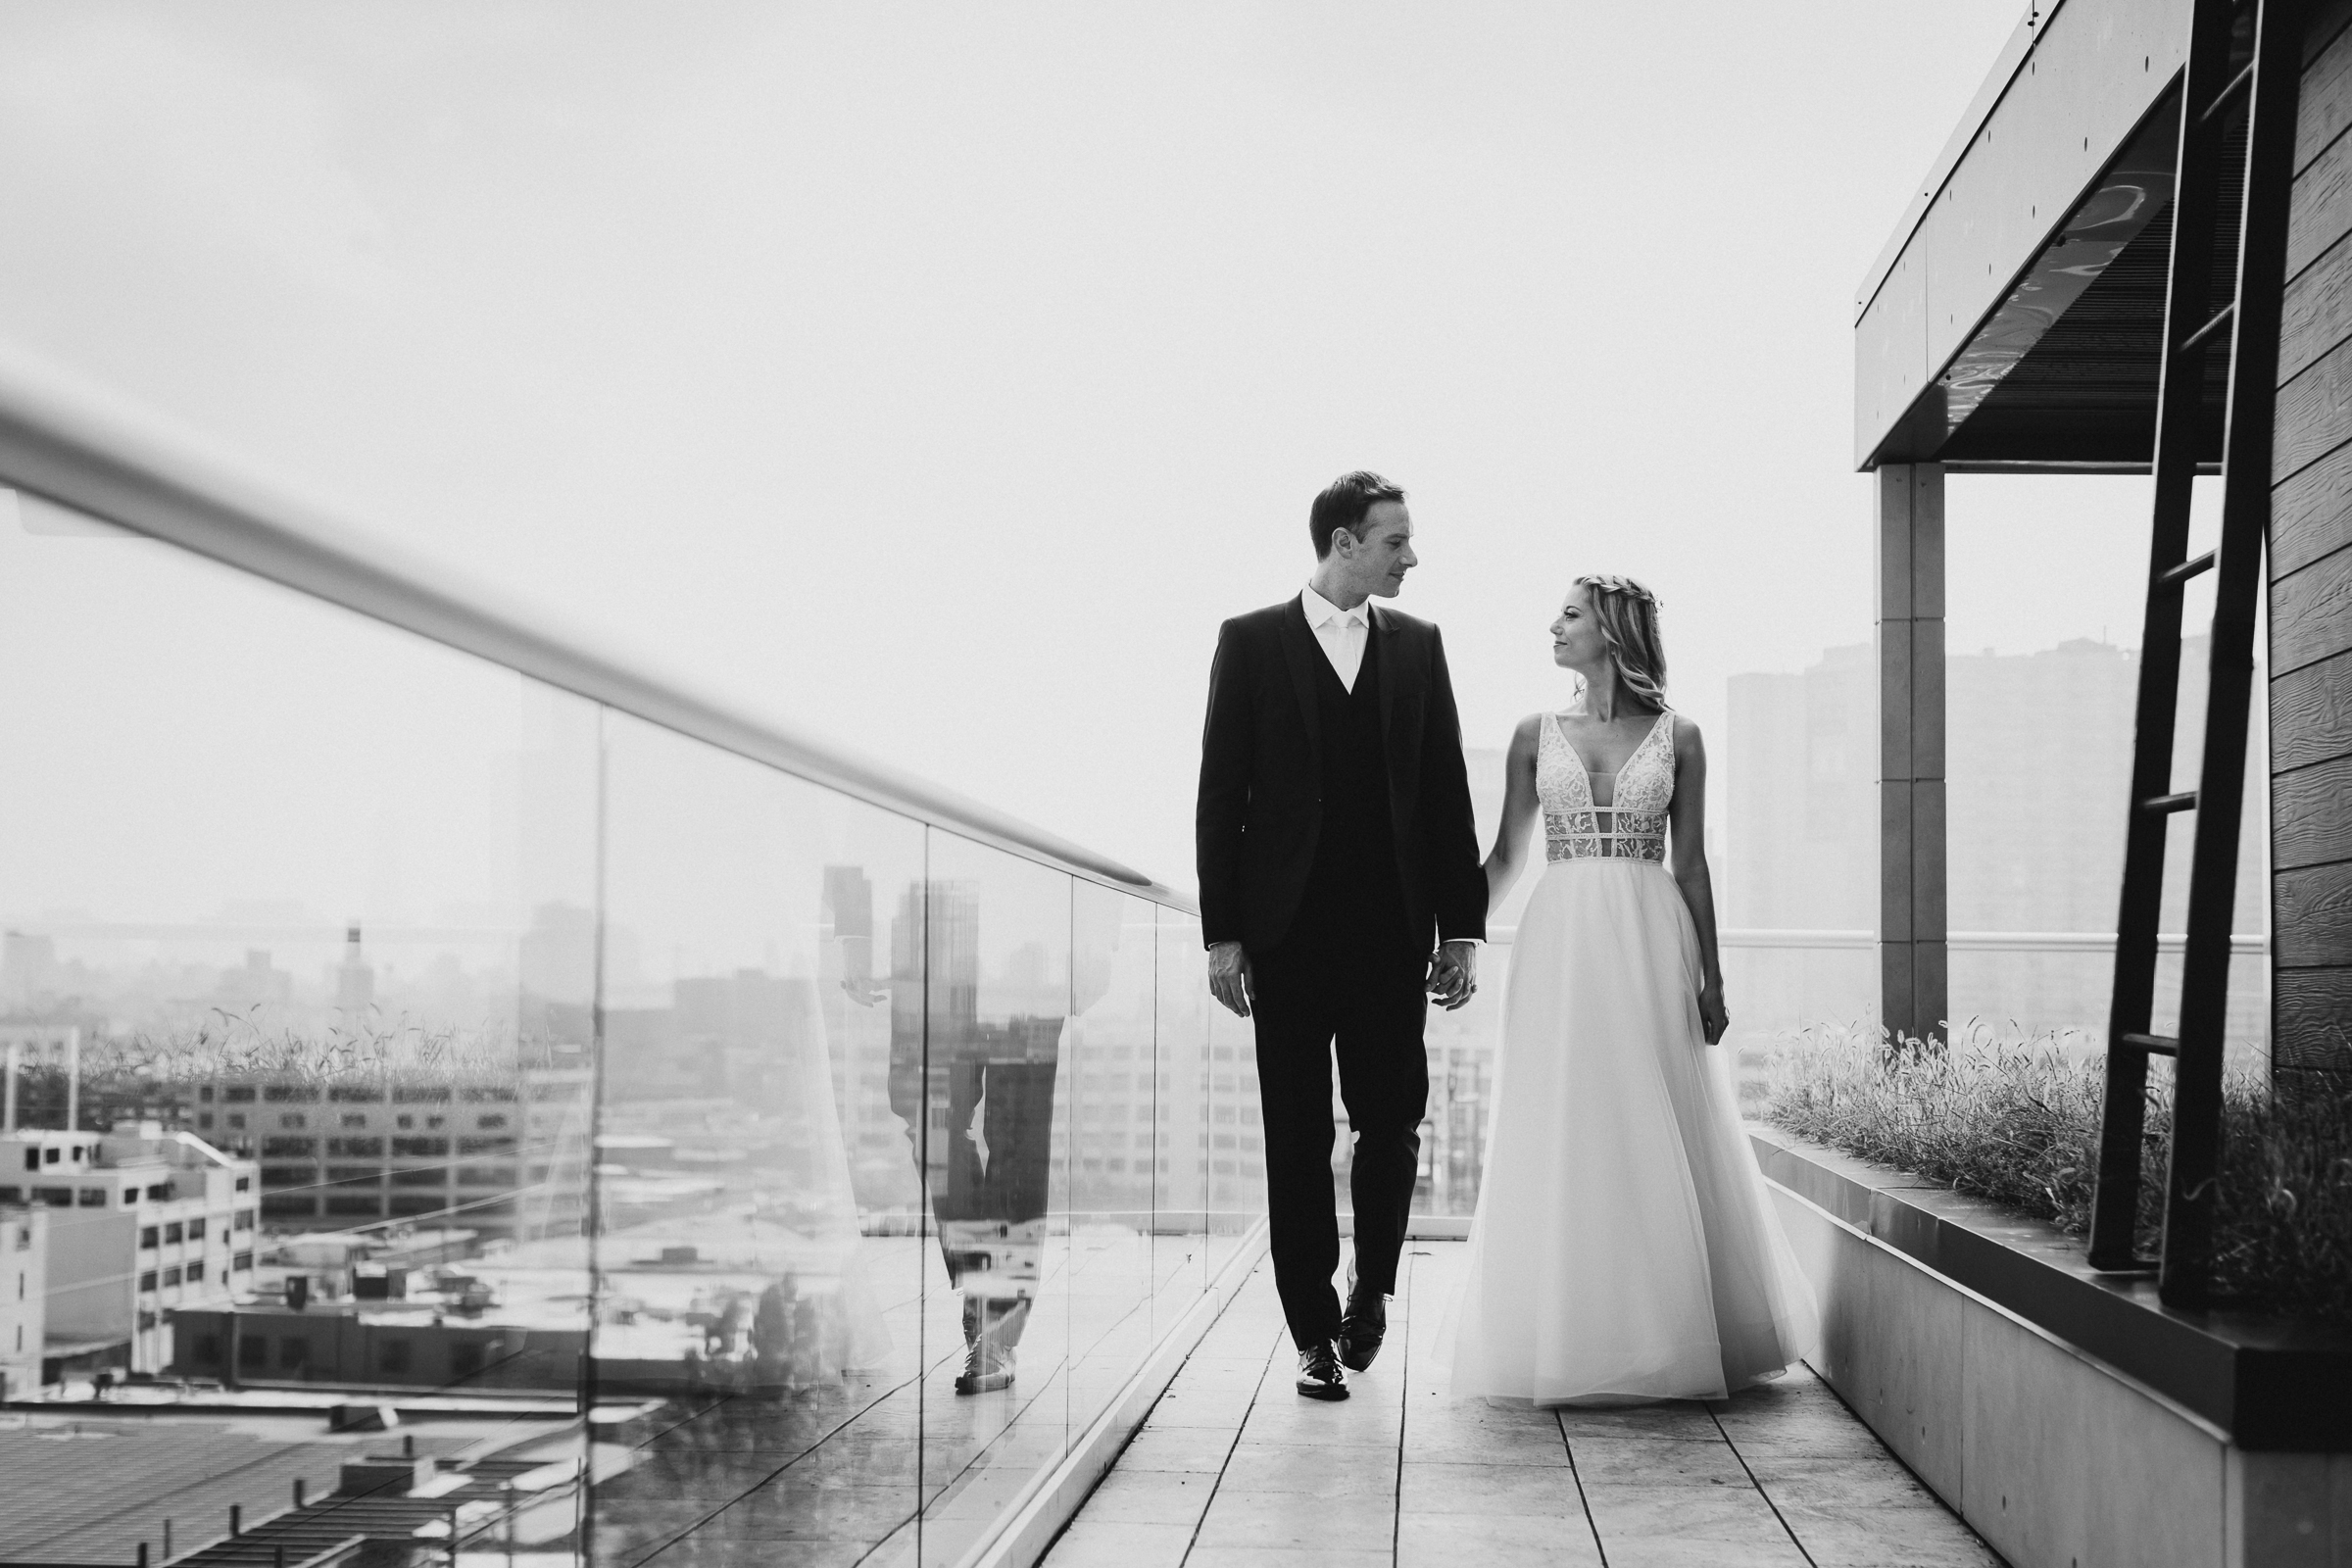 Ravel-Hotel-Penthouse-808-Long-Island-City-New-York-Documentary-Wedding-Photographer-27.jpg